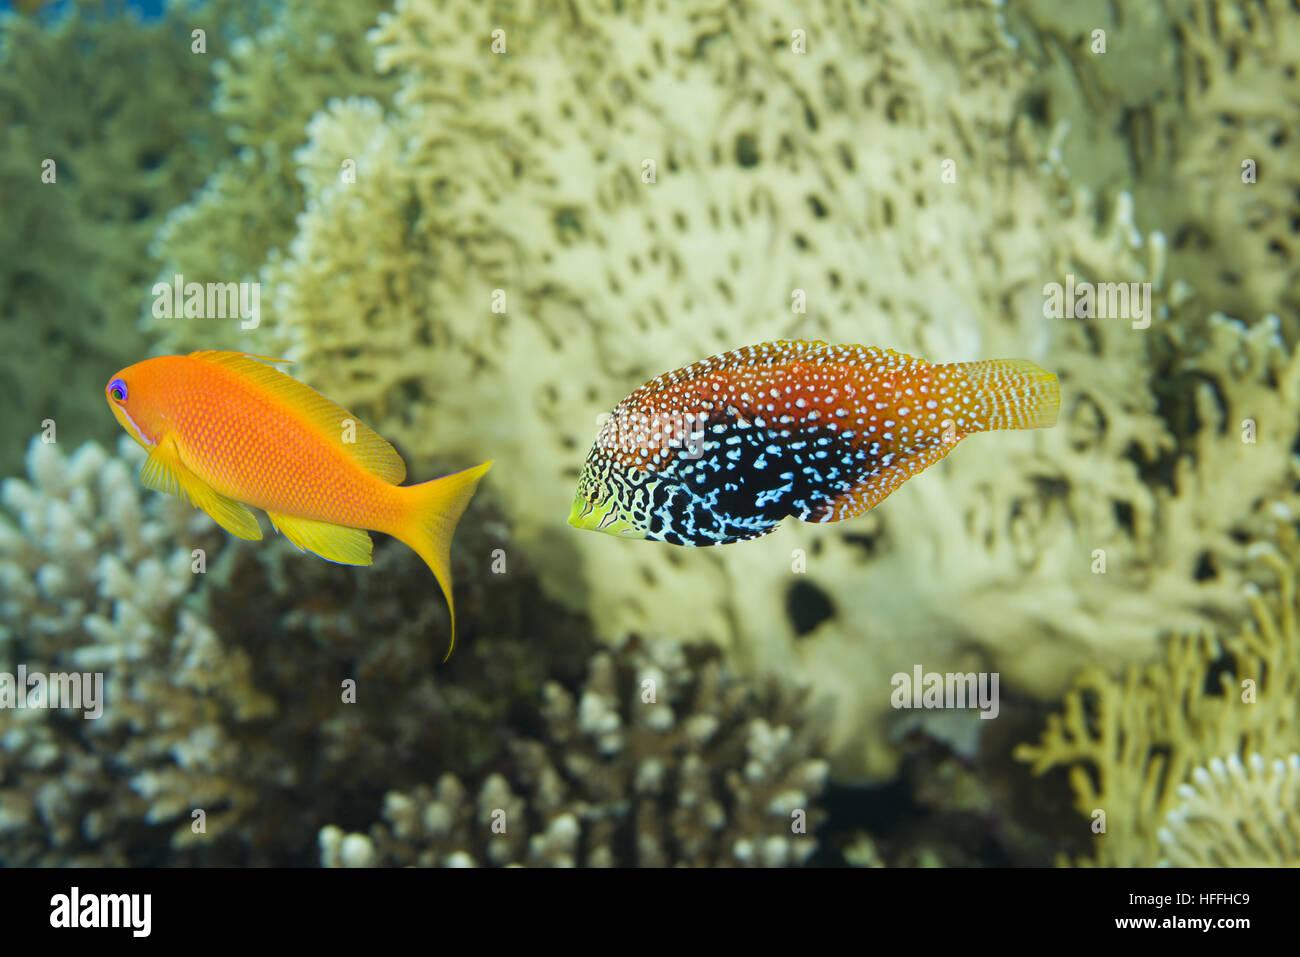 Vermiculate Wrasse or Diamond wrasse (Macropharyngodon bipartitus) and female Sea goldie or Lyretail coralfish (Pseudanthias - Stock Image